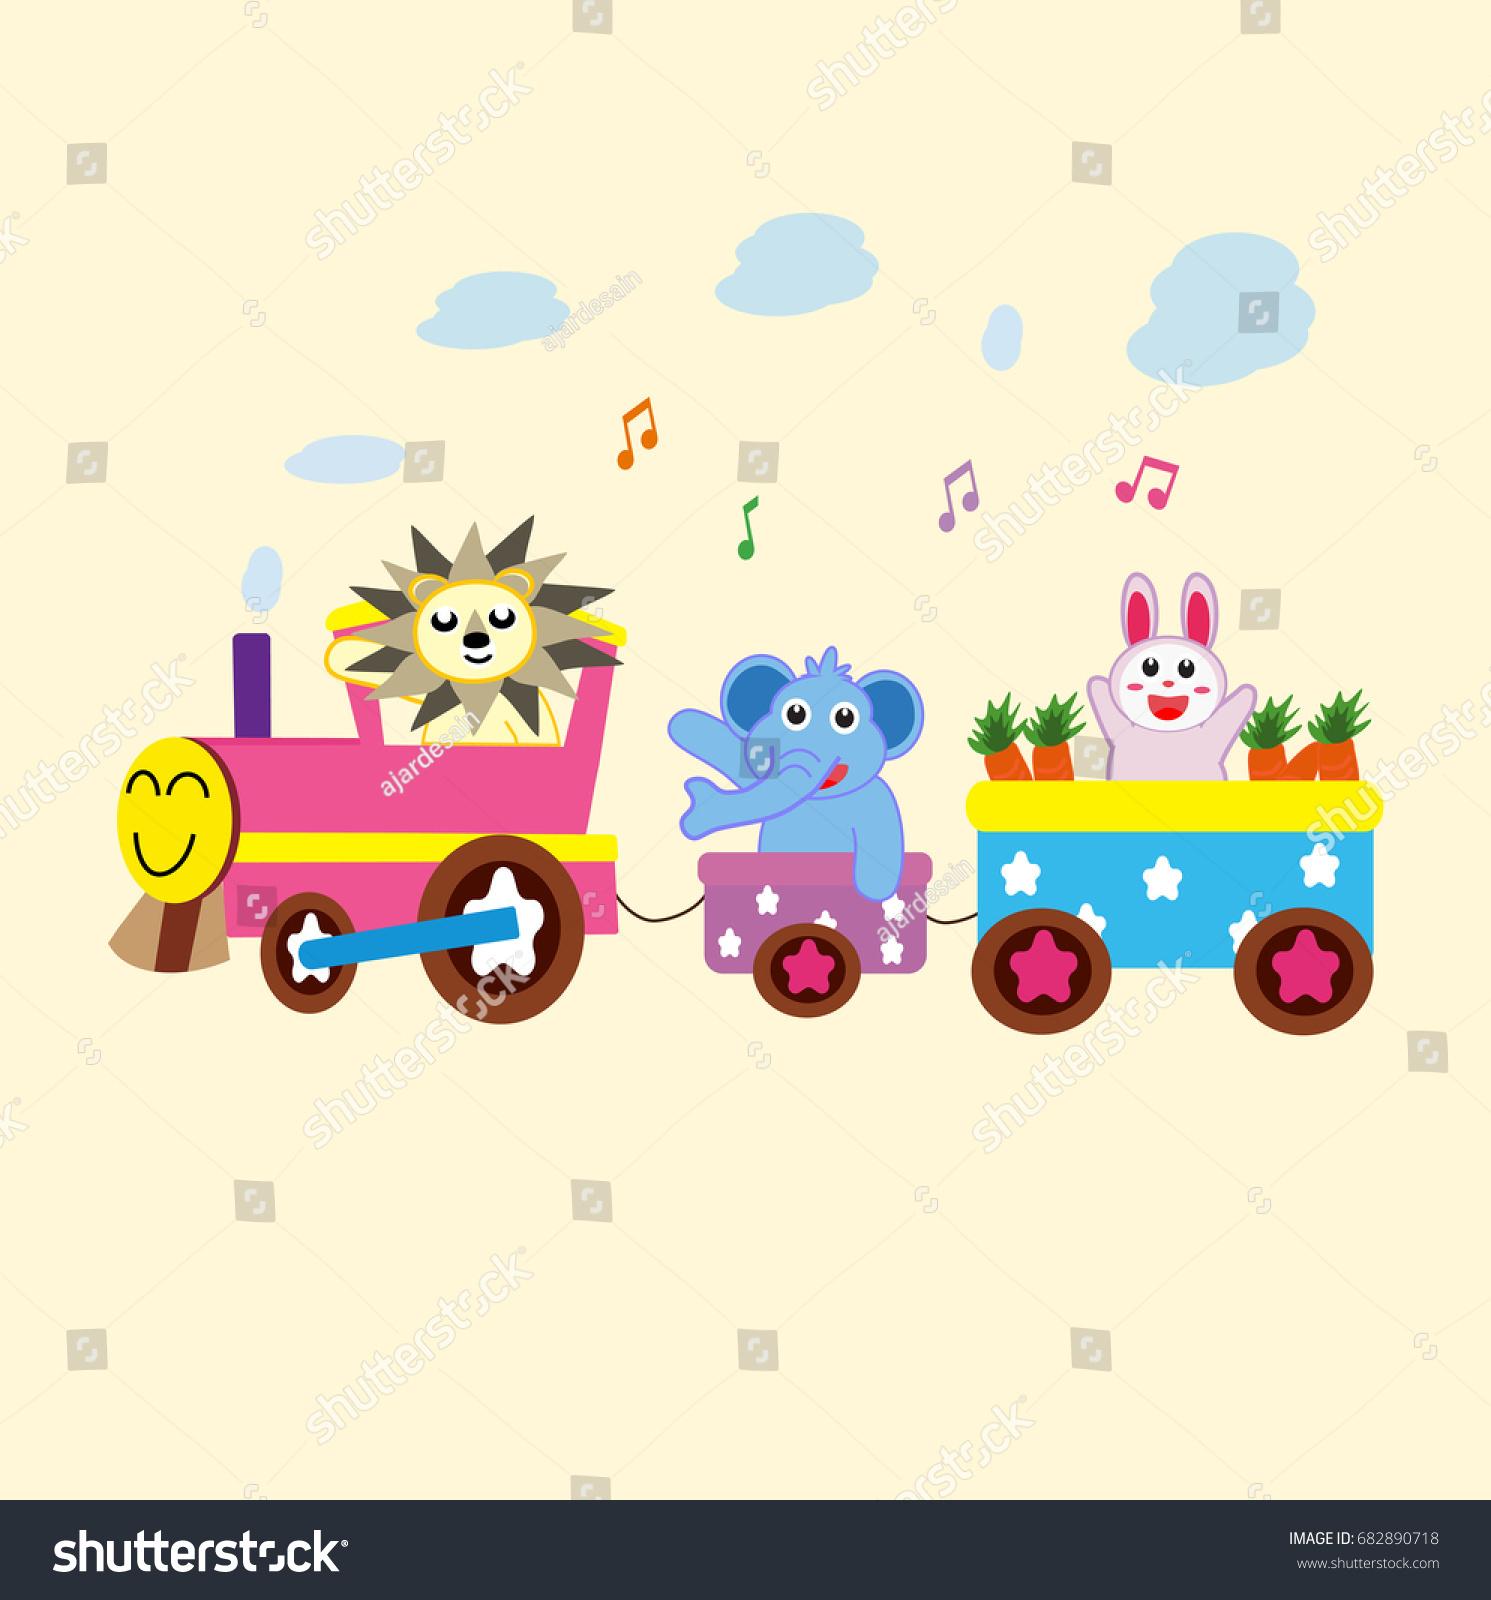 Cute Elephant Design Wallpaper Cute Animal Ride Train Vector Cartoon Stock Vector